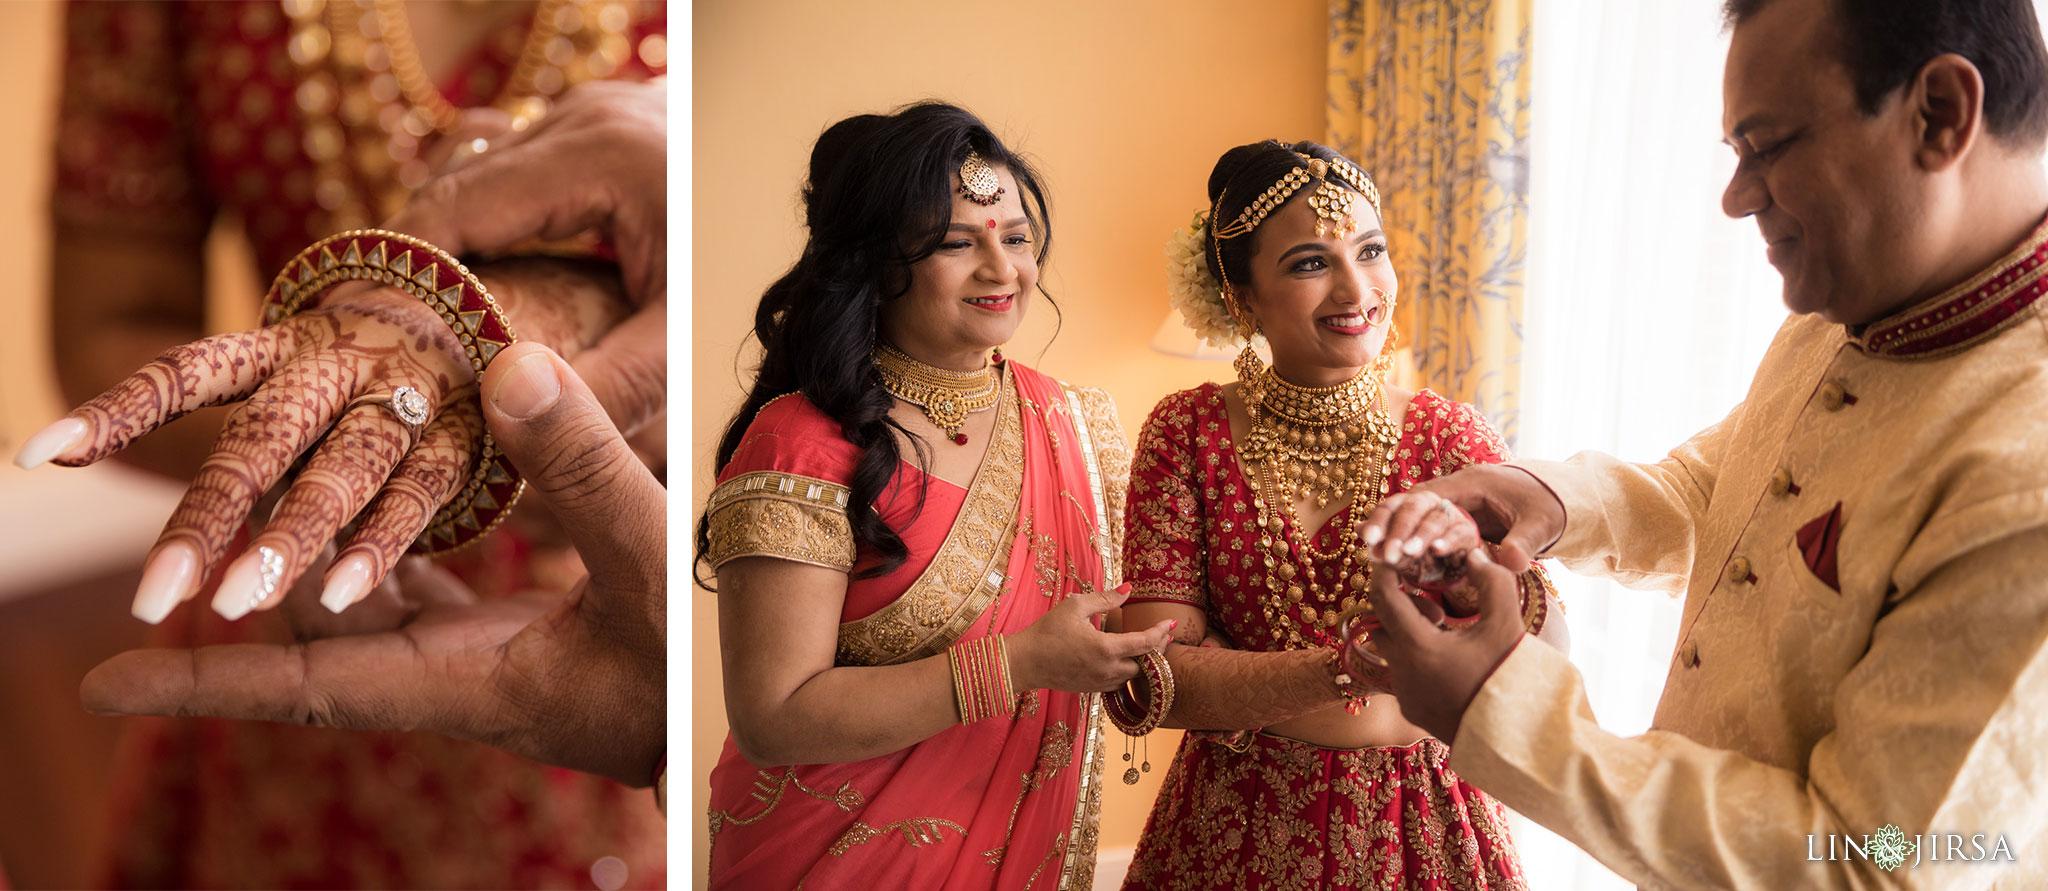 03 four seasons westlake village indian wedding photography